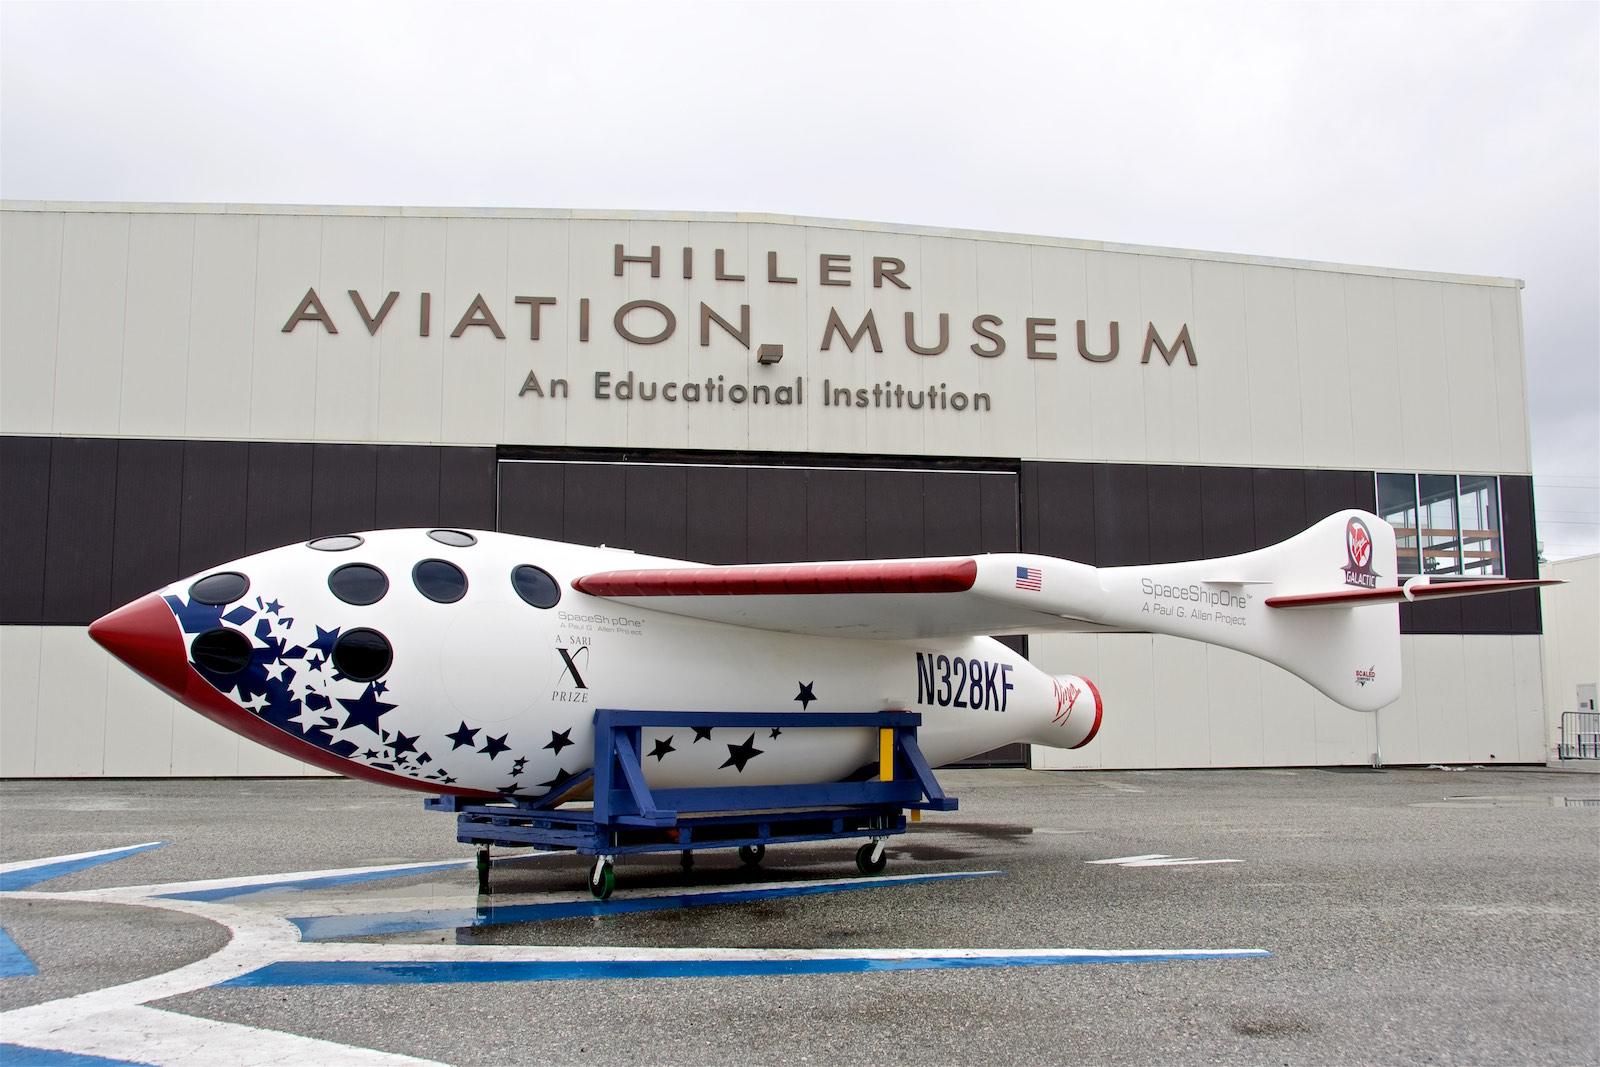 Hiller Football Fest,   SpaceShipOne replica,